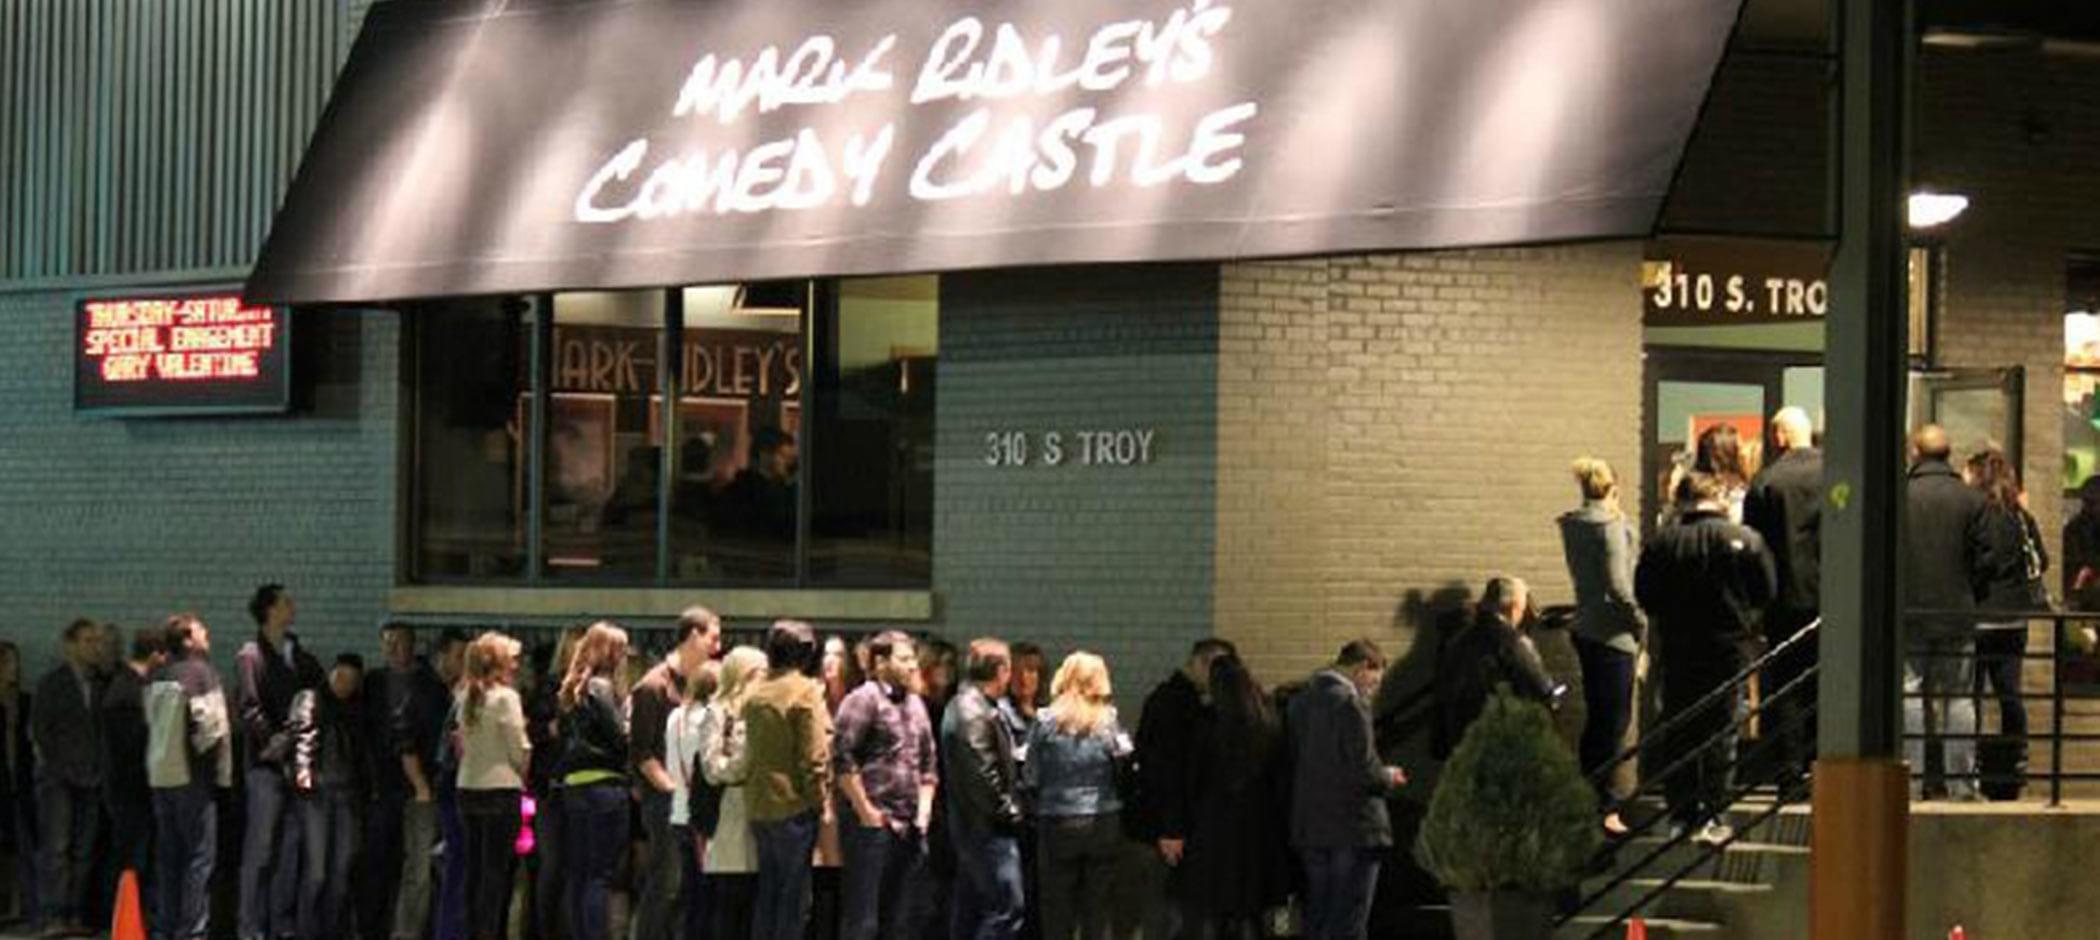 Mark Ridley's Comedy Castle exterior